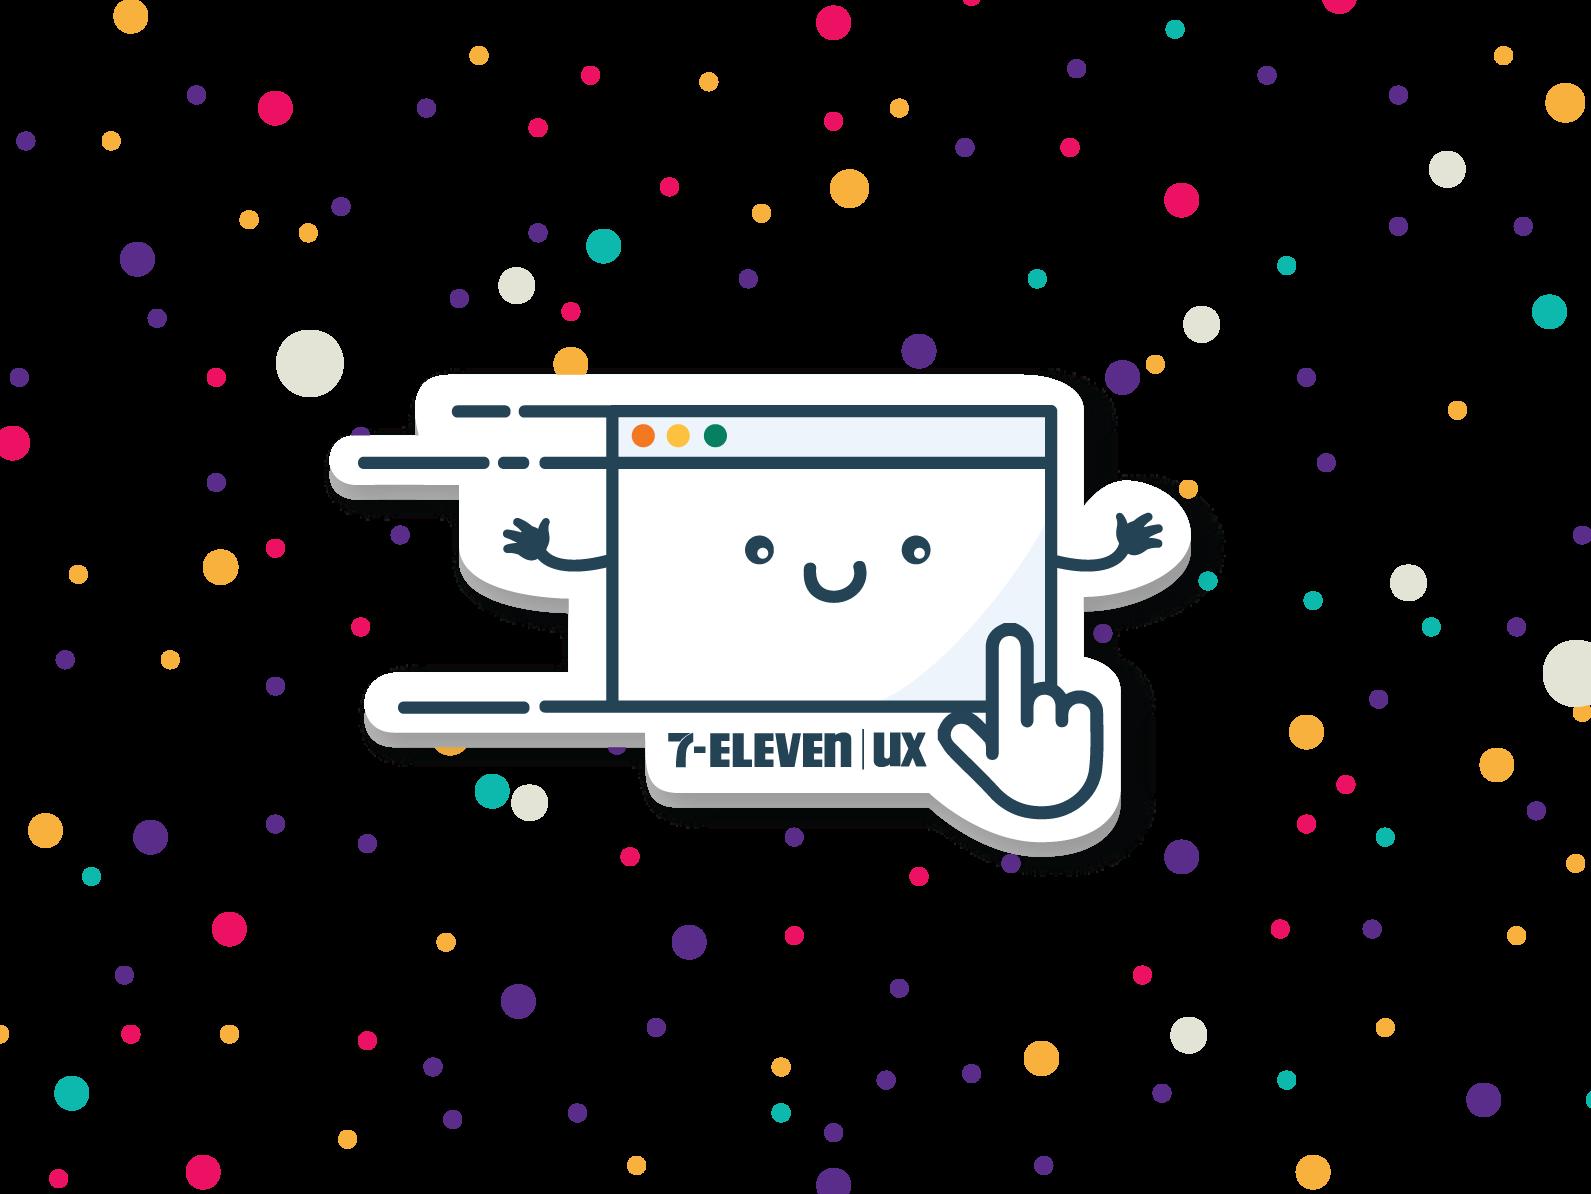 A flying screen 7-eleven illustrator illustration 2danimation confetti click characterdesign cute character screen stickers sticker ux